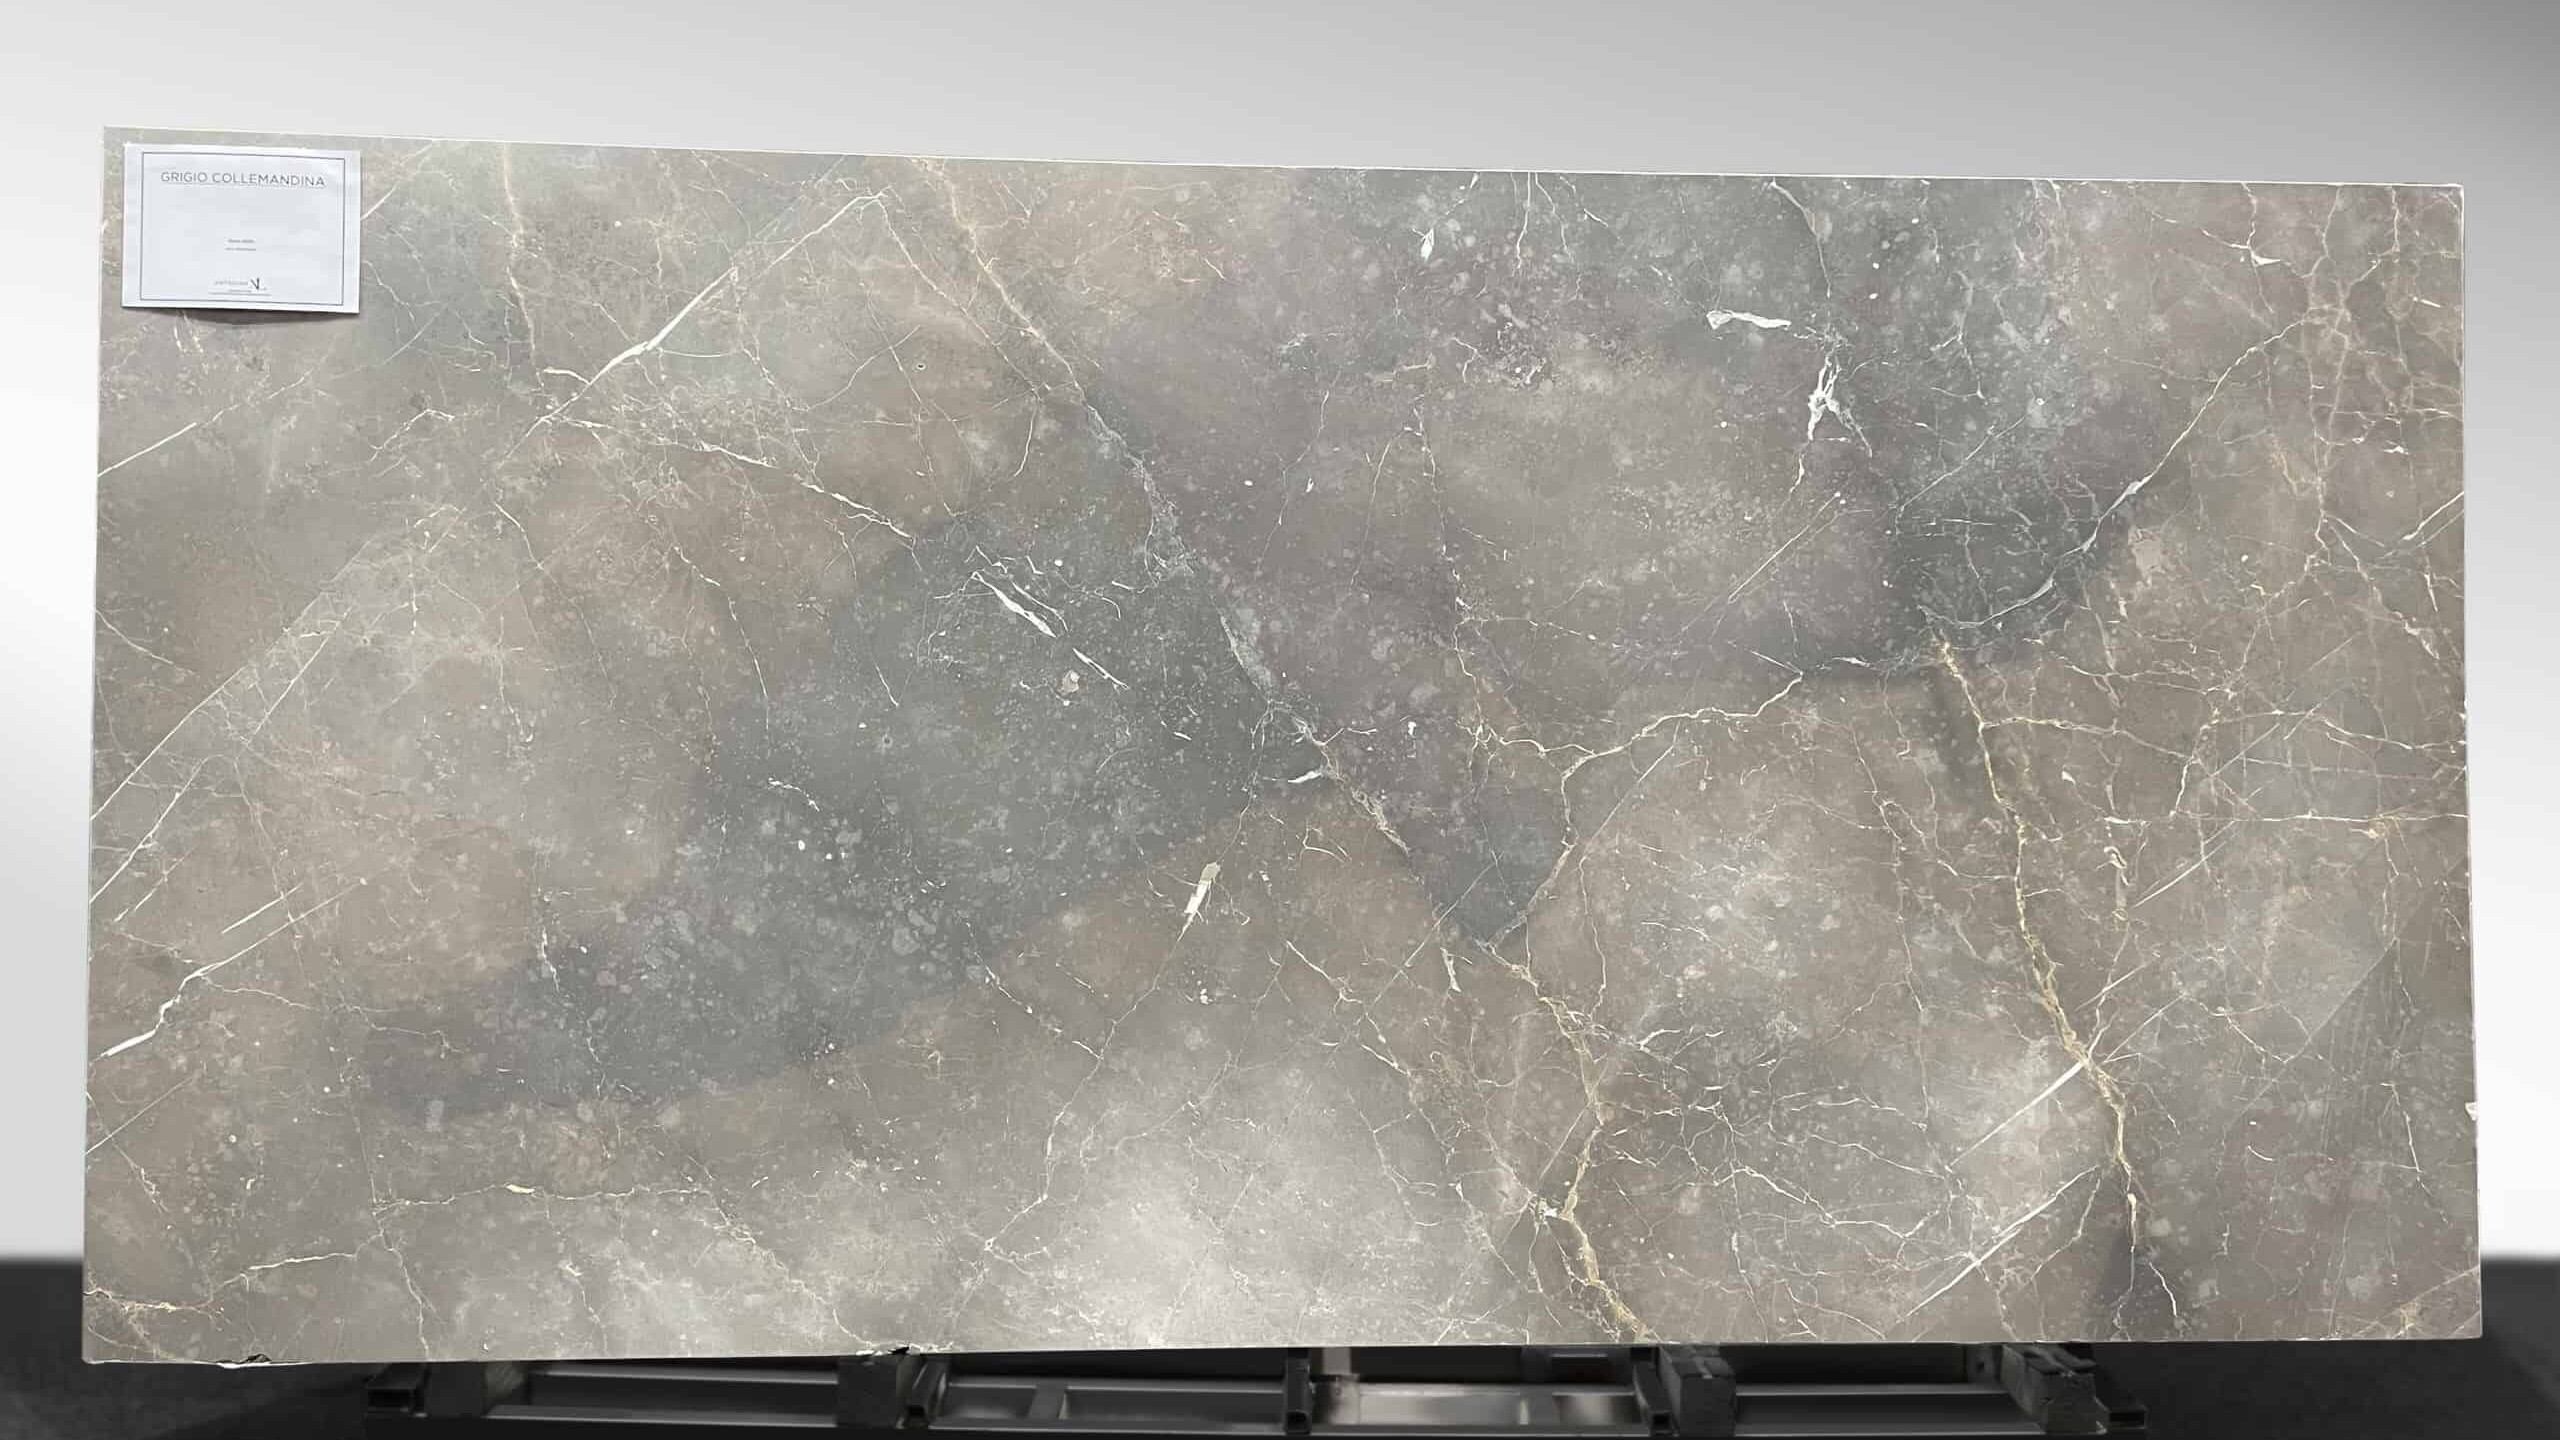 Grigio Collemandina Natural Stone